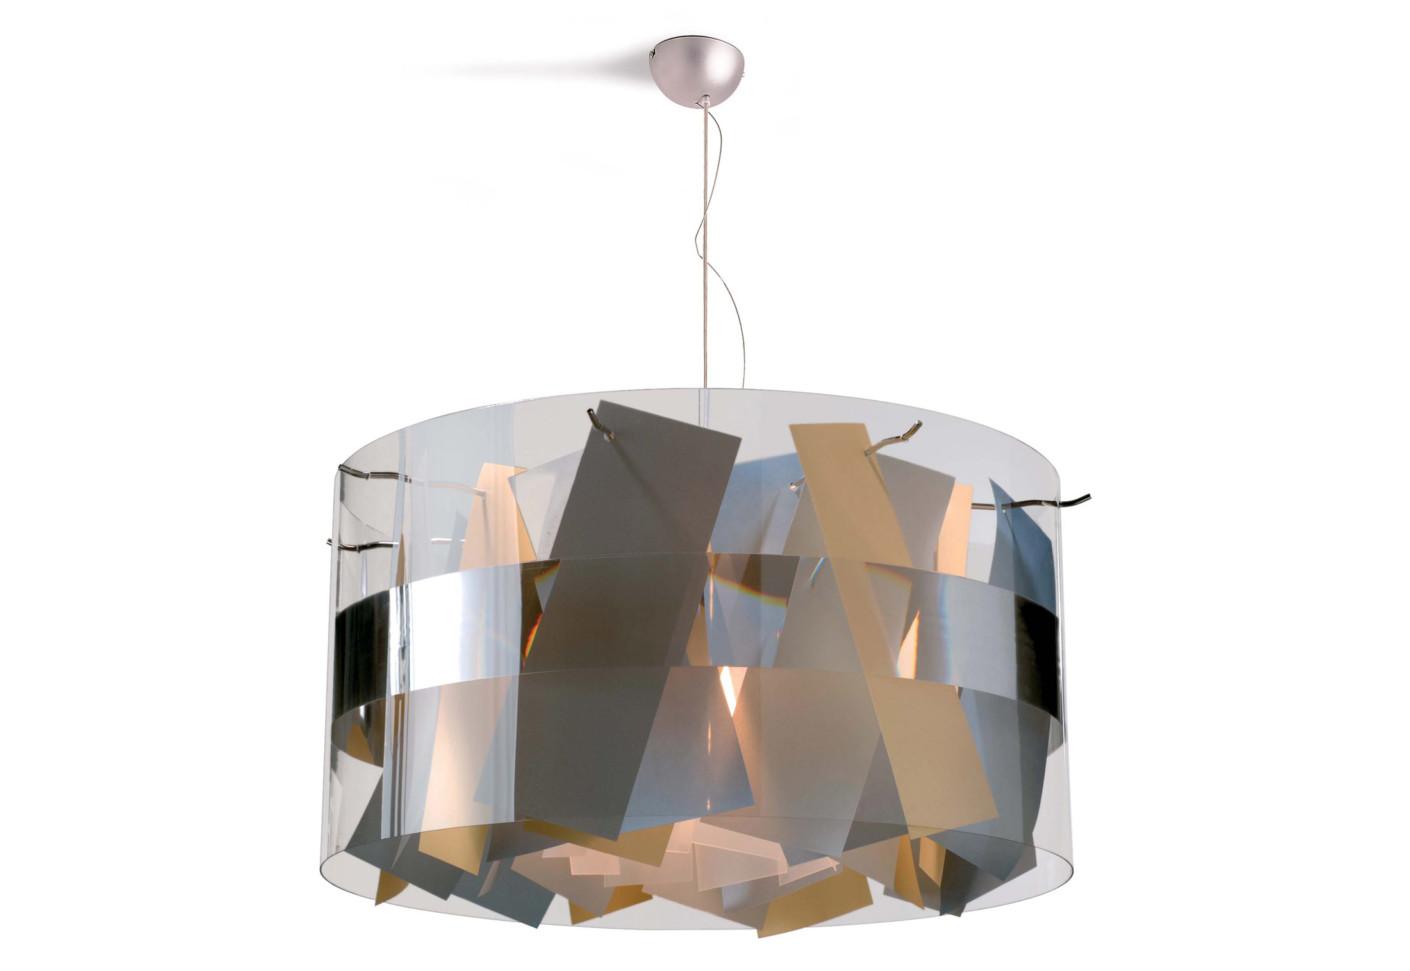 holo 47 saint petersbourg von dix heures dix stylepark. Black Bedroom Furniture Sets. Home Design Ideas